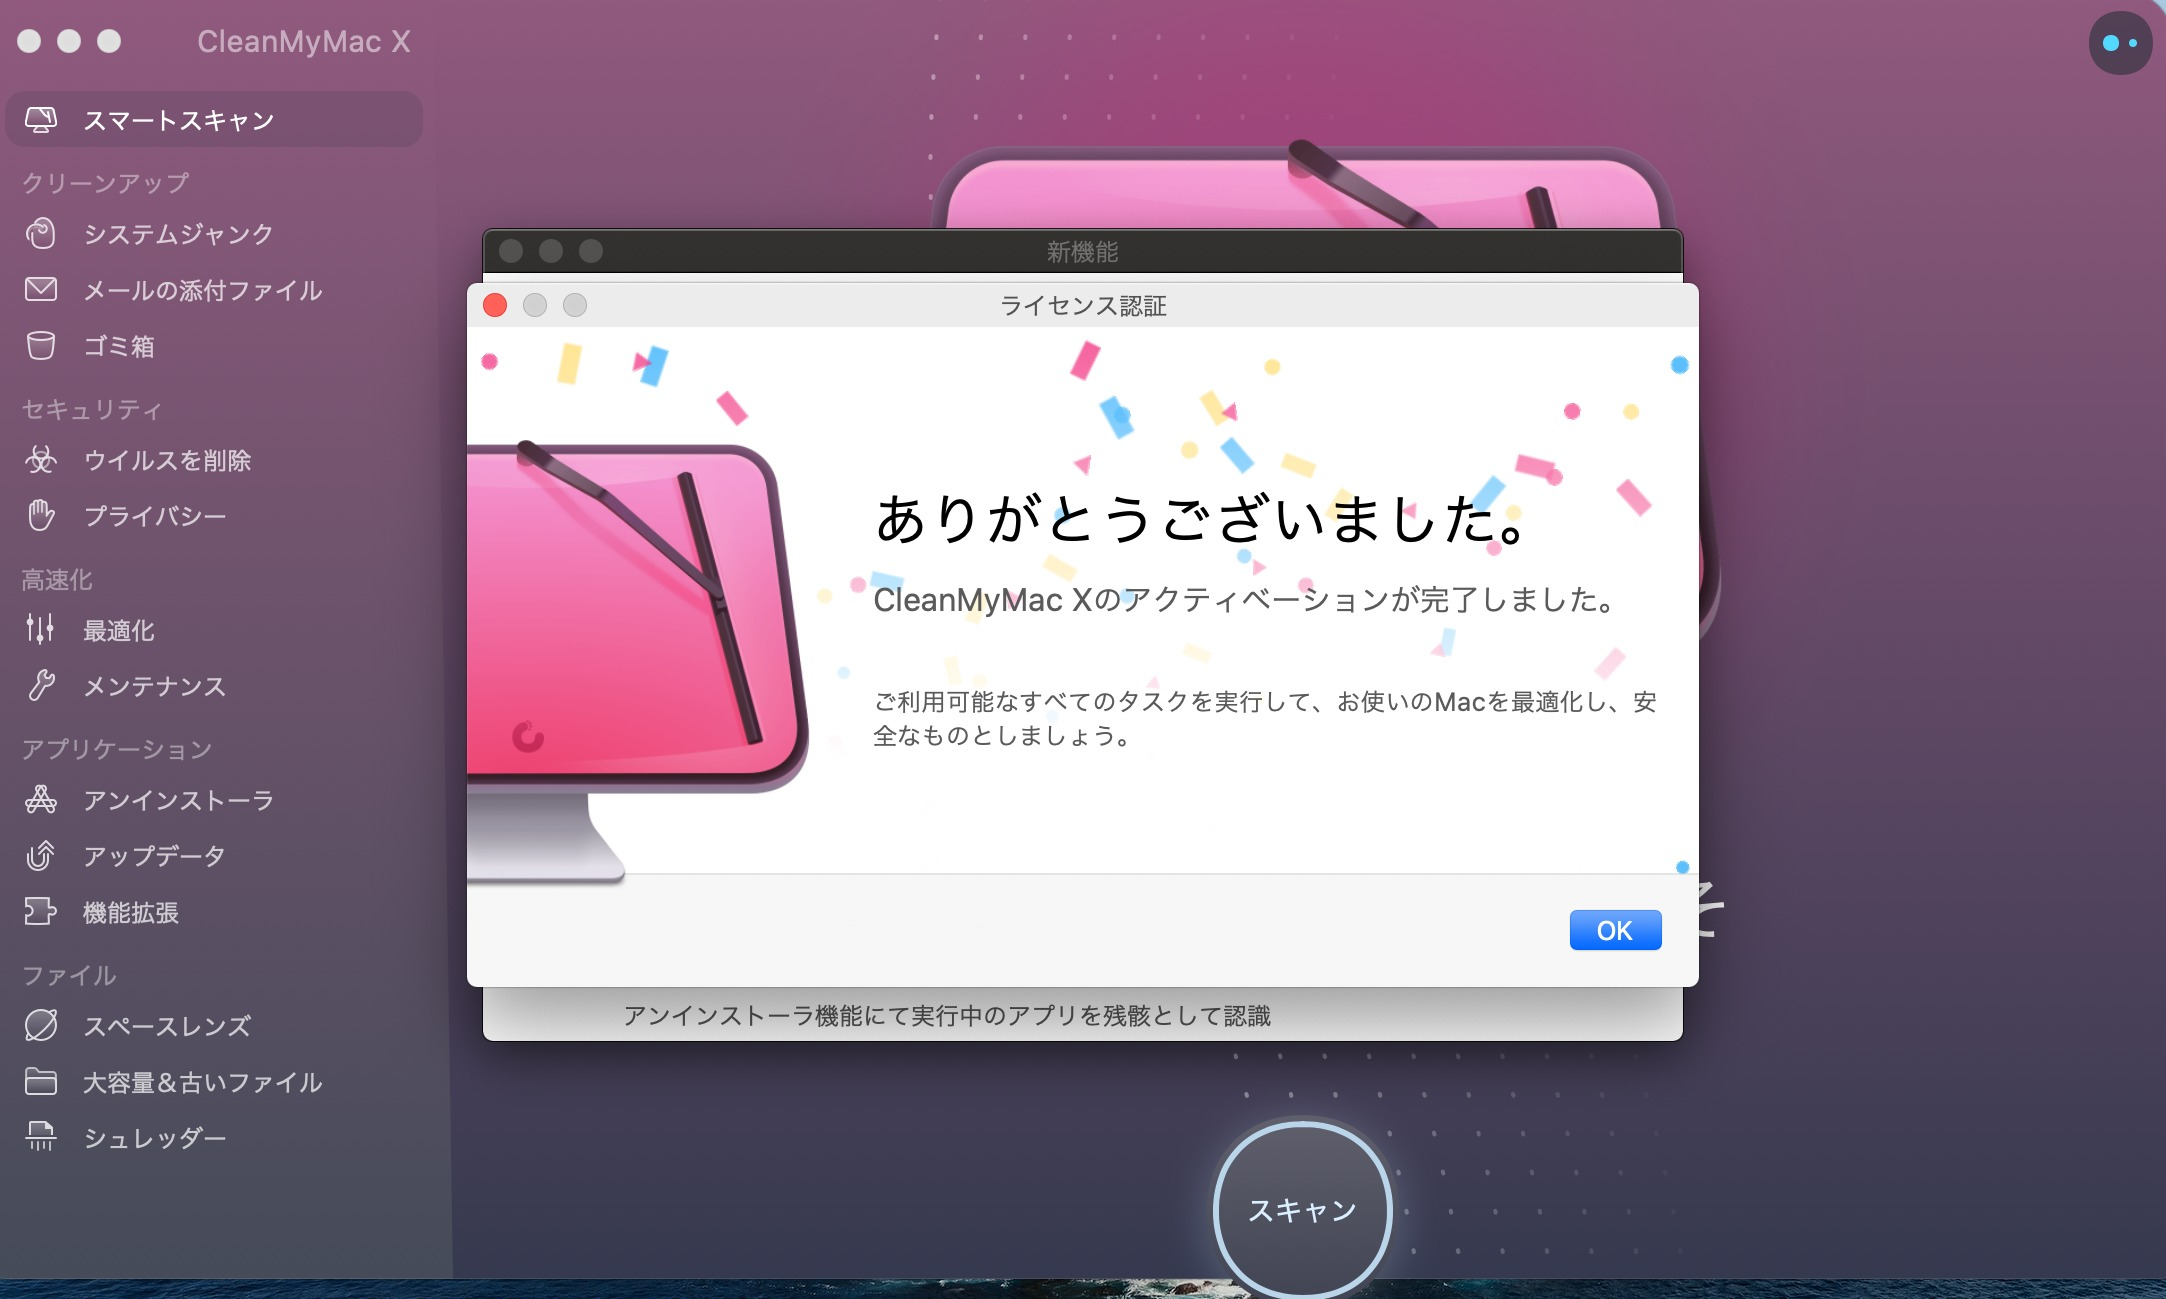 CleanMyMac X ライセンス 入力